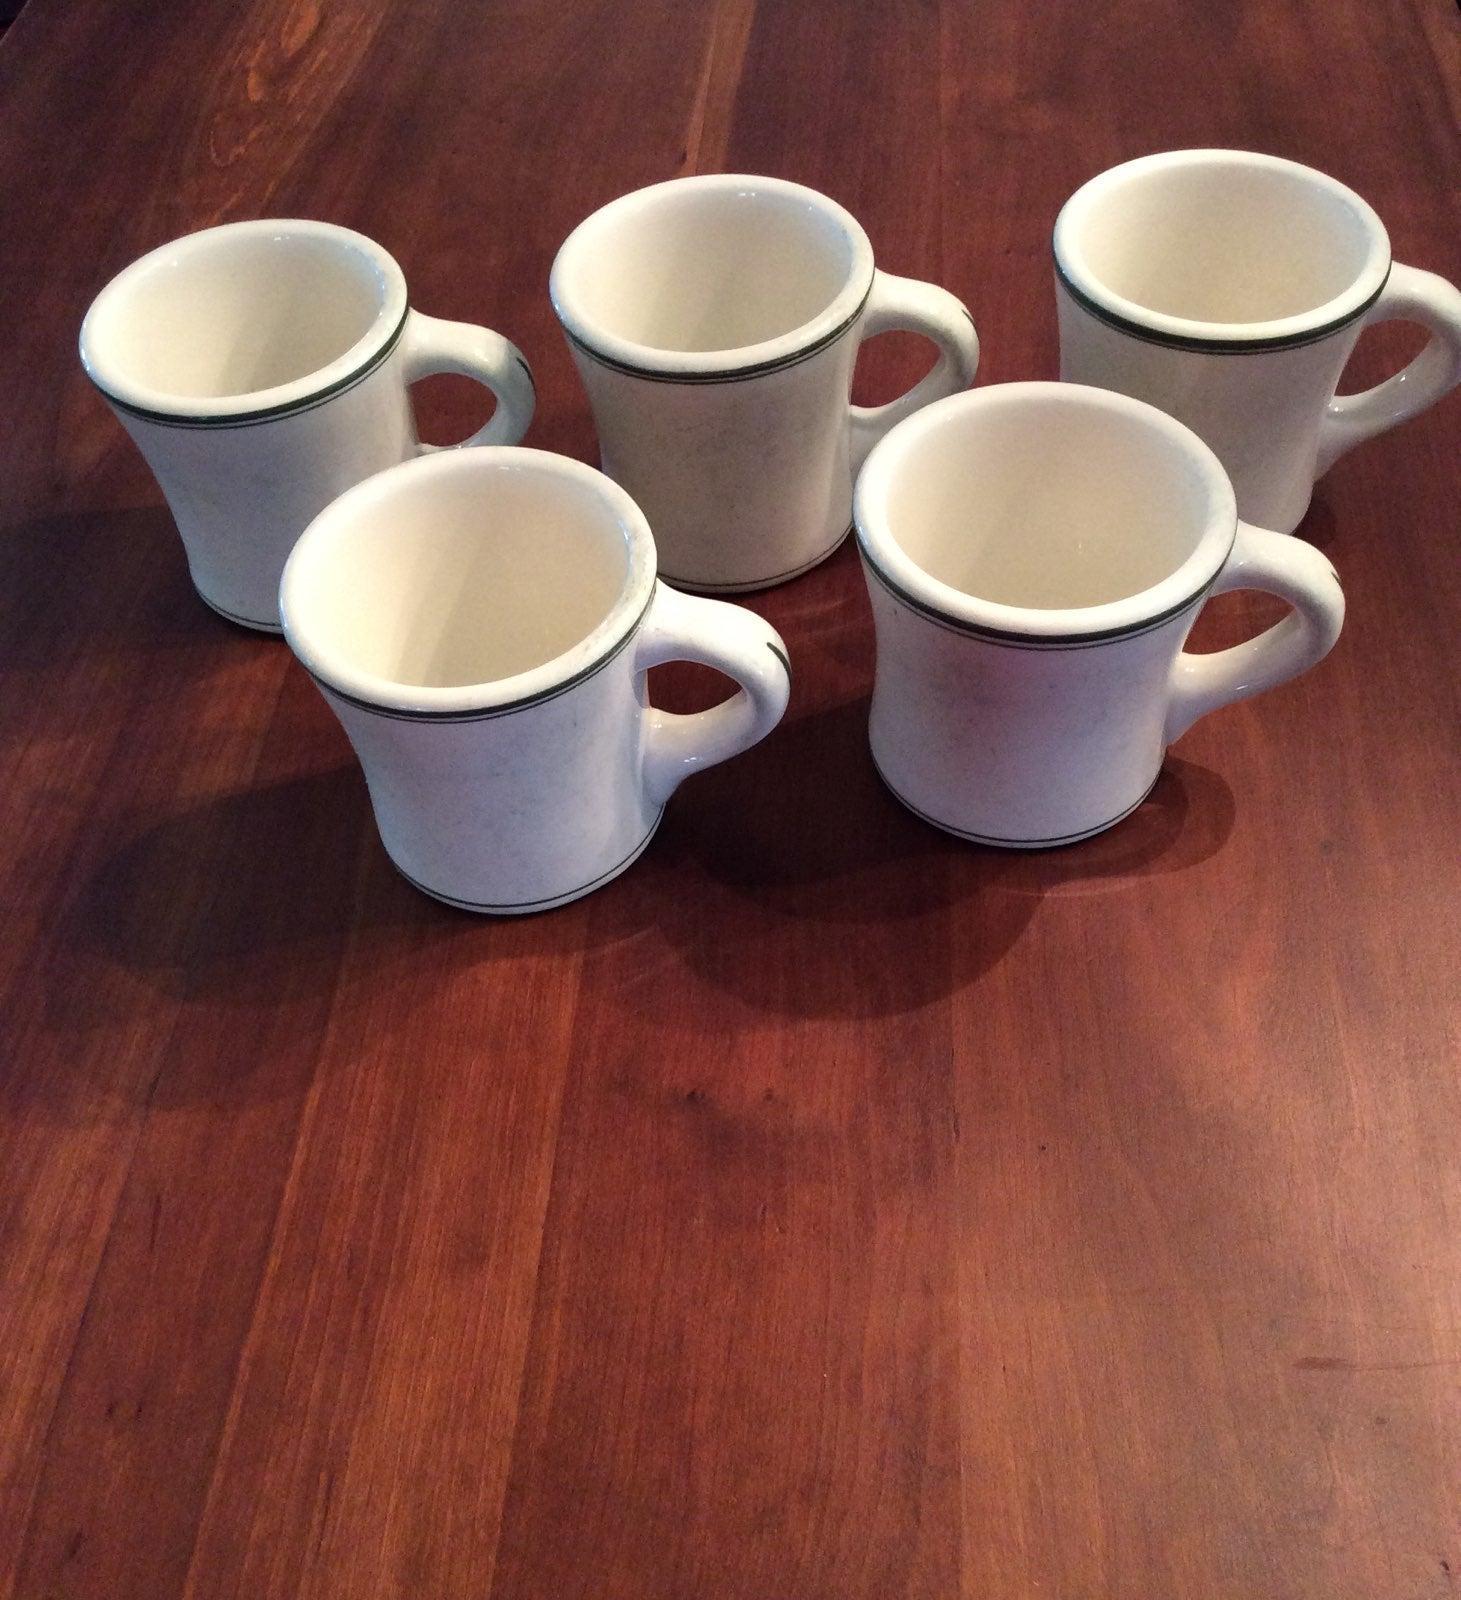 5 Vintage Coffee Mugs Warwick 1938 Made